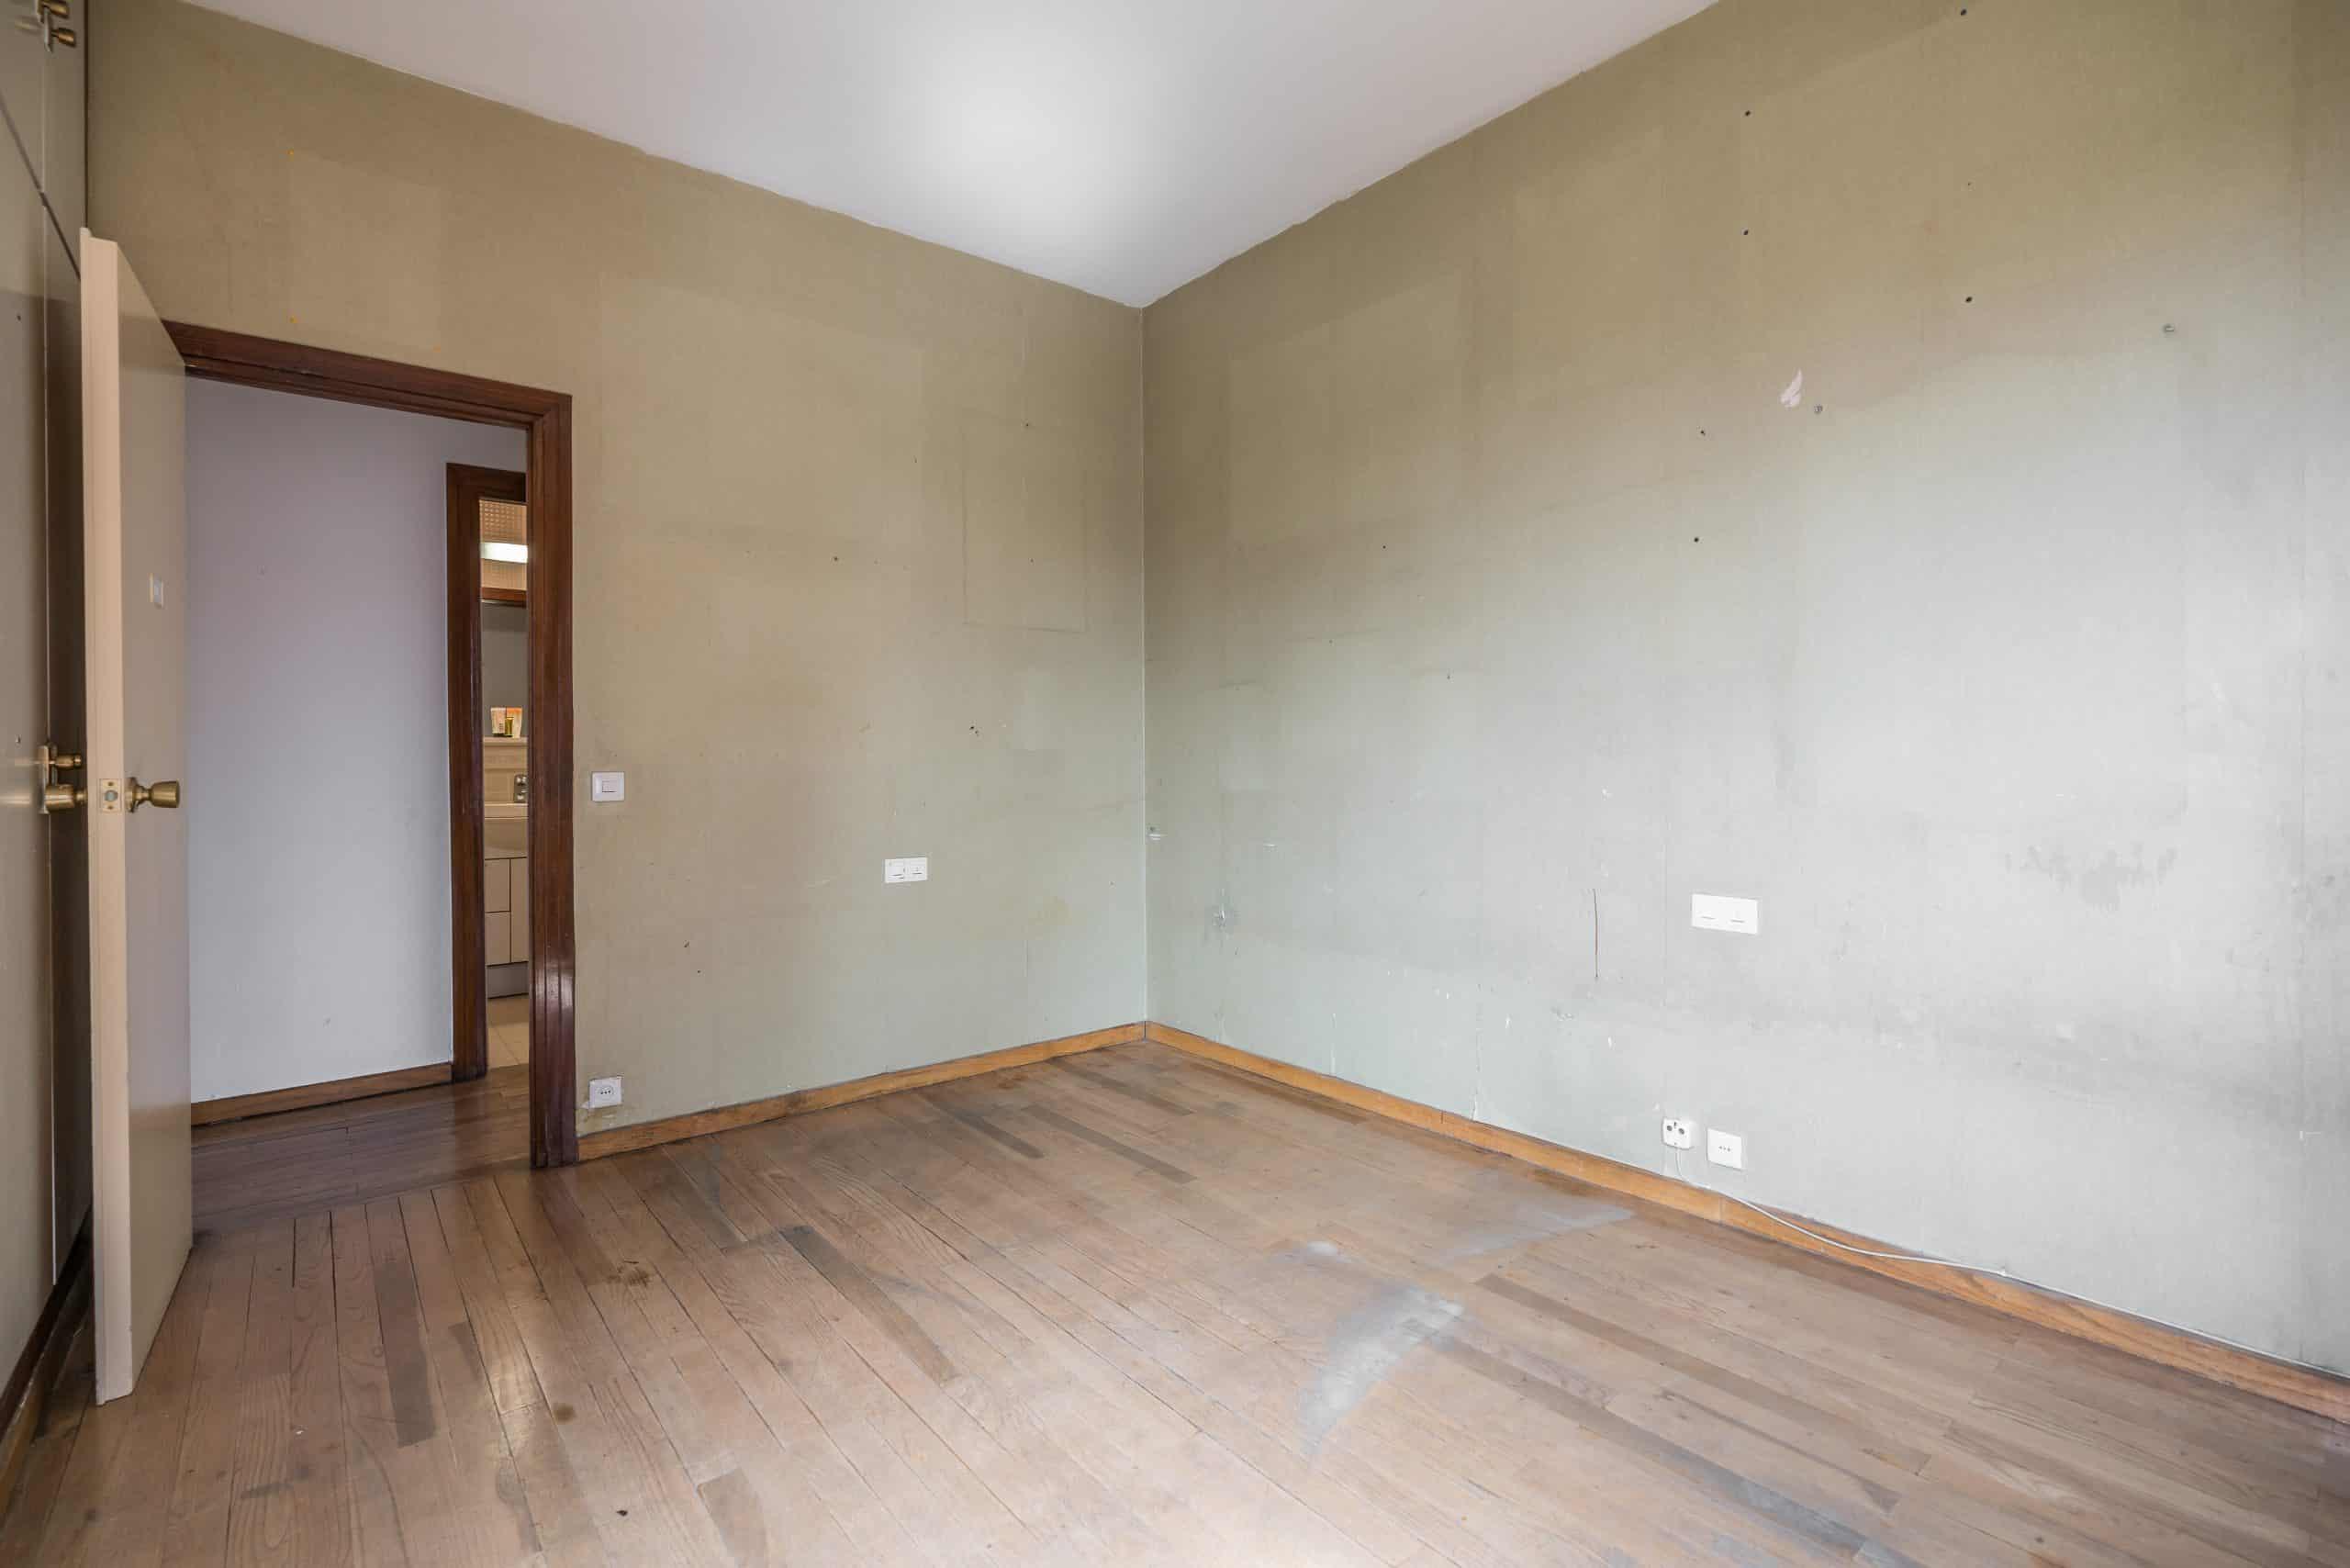 Agencia Inmobiliaria de Madrid-FUTUROCASA-Zona ARGANZUELA-EMBAJADORES-LEGAZPI -calle Embajadores- baño 139